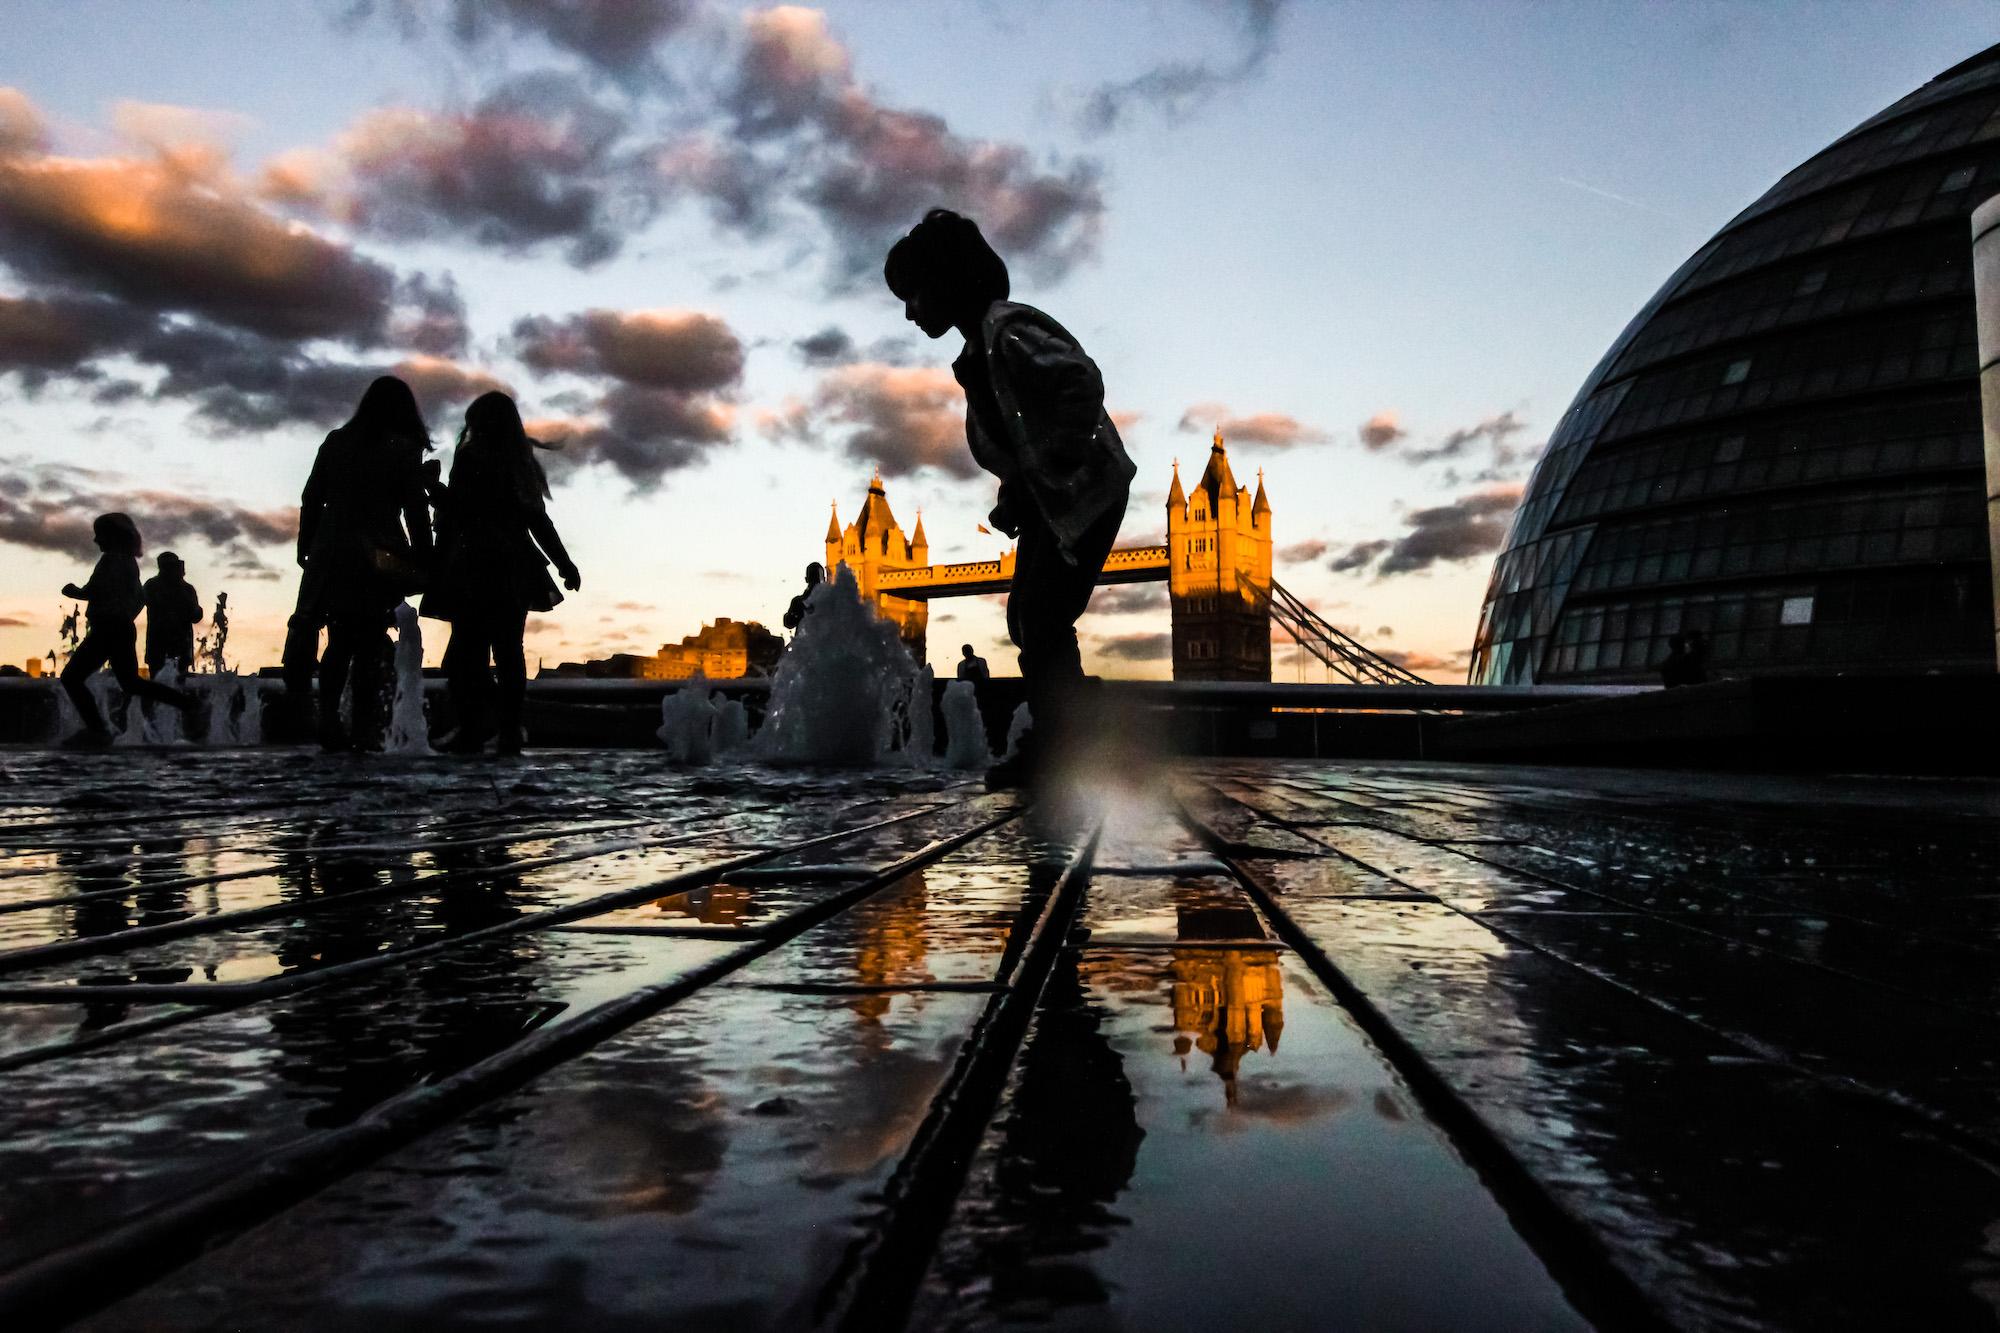 Low camera angle at City Hall and Tower Bridge, London